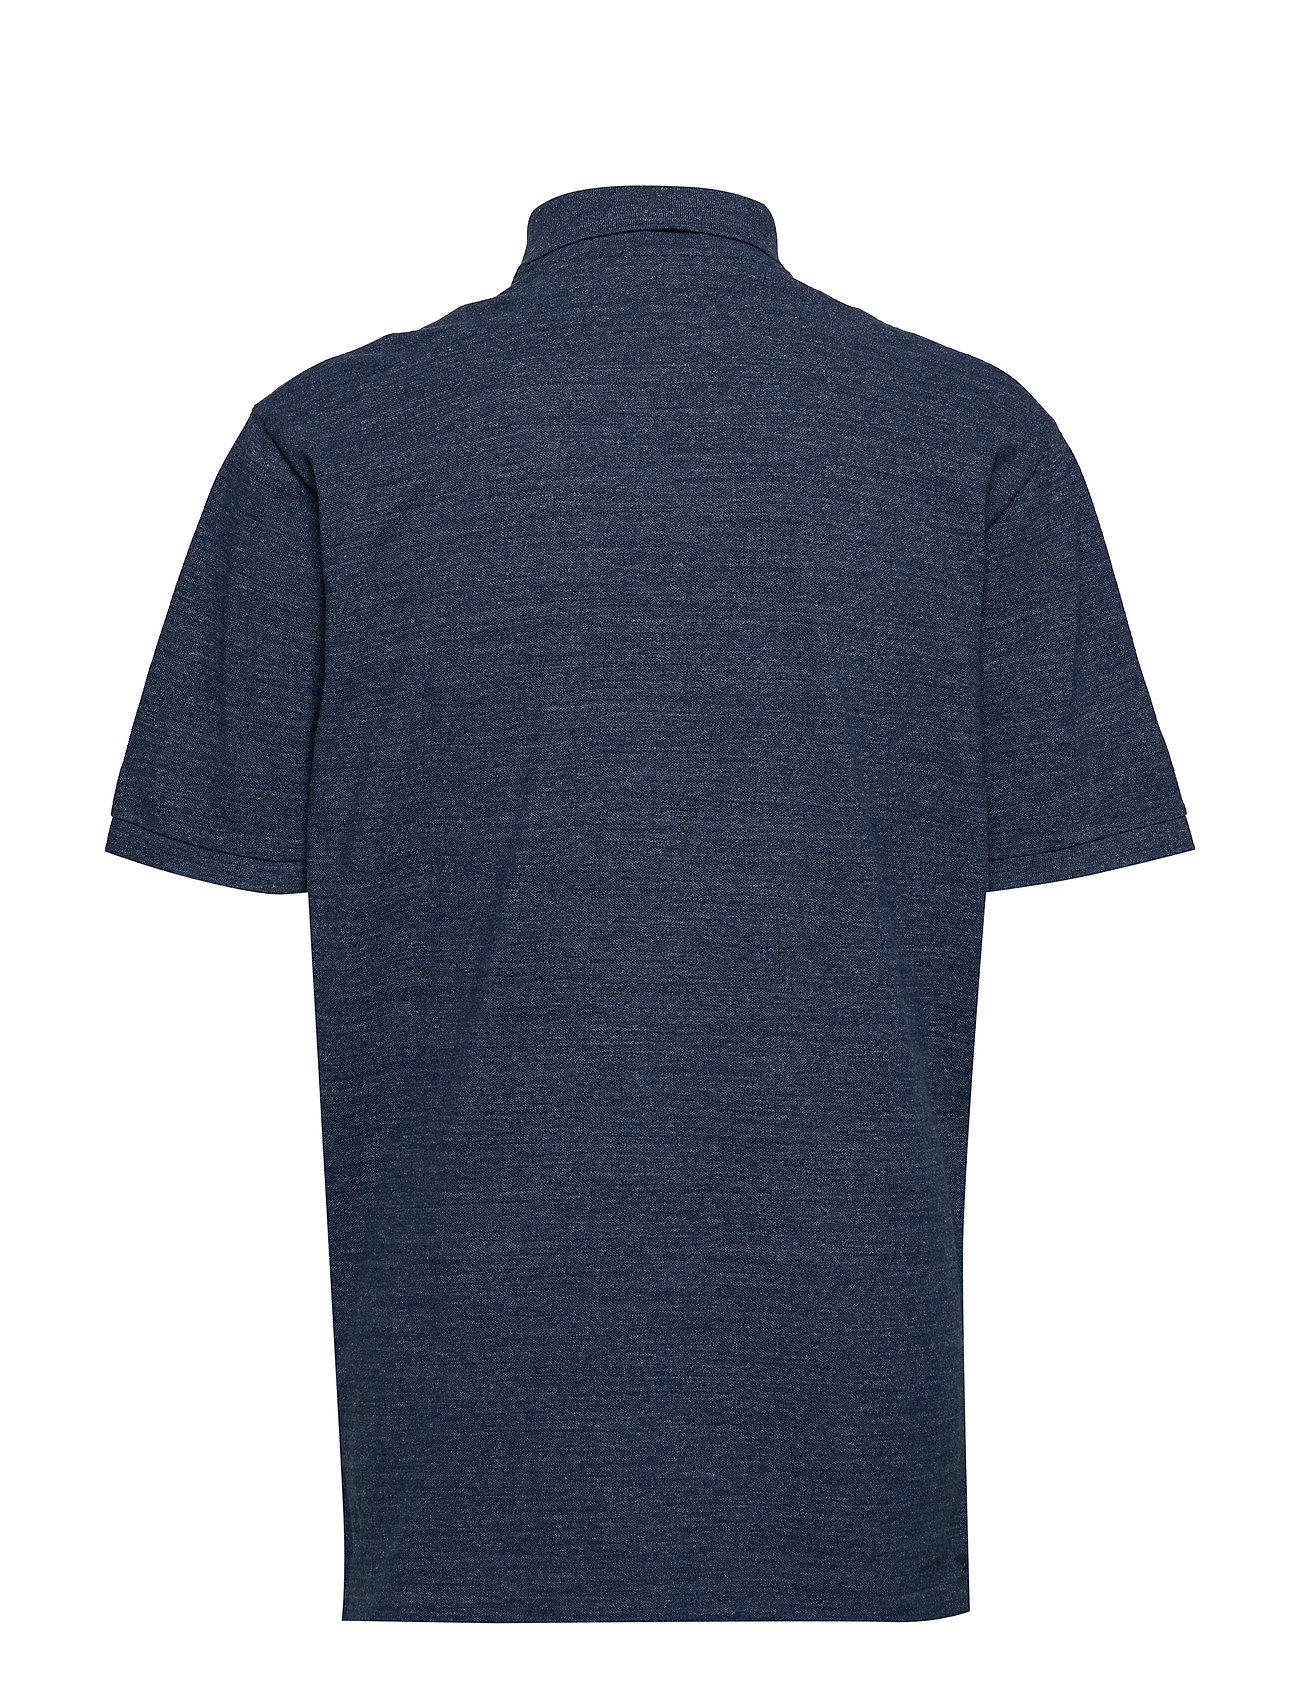 Royal Bigamp; Classic Shirtclassic HeaRalph Polo Fit Mesh Lauren Tall lF1JcTK3